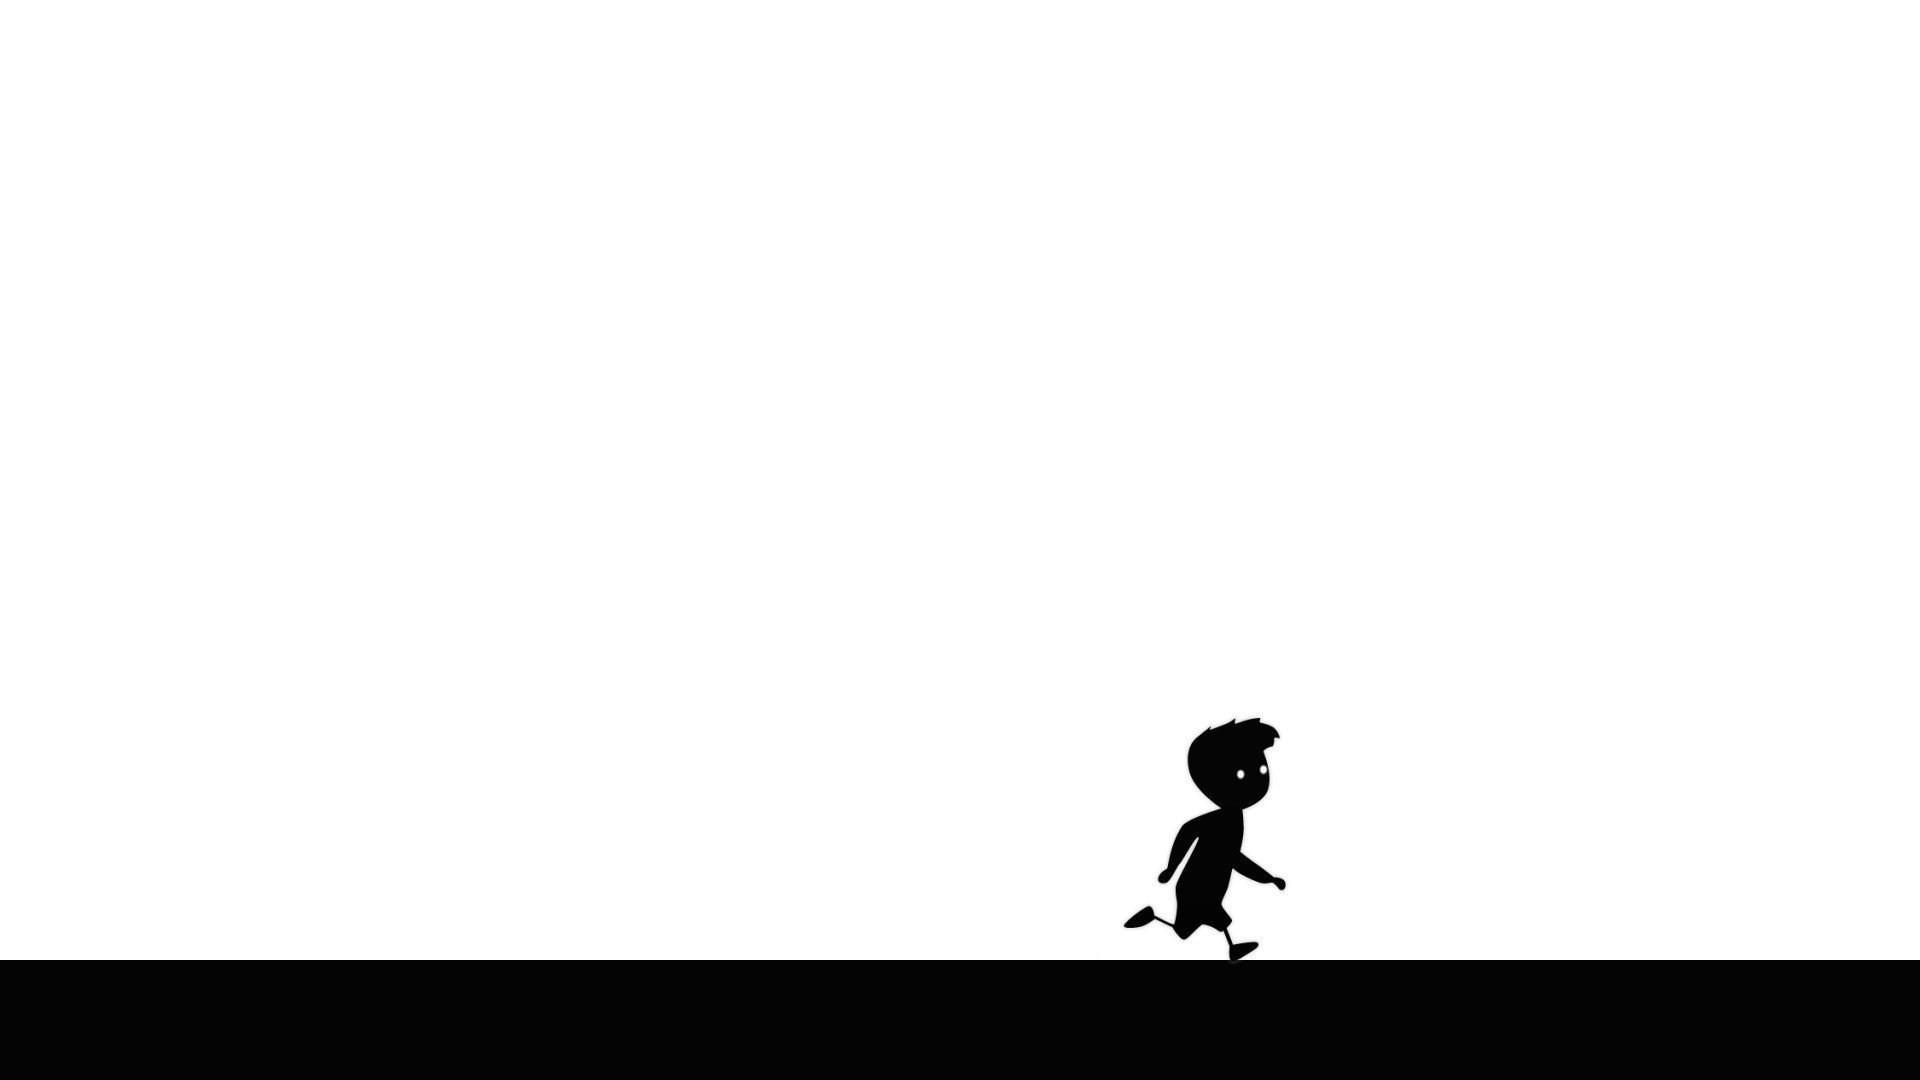 Limbo Game Minimalism Hd Games 4k Wallpapers Images